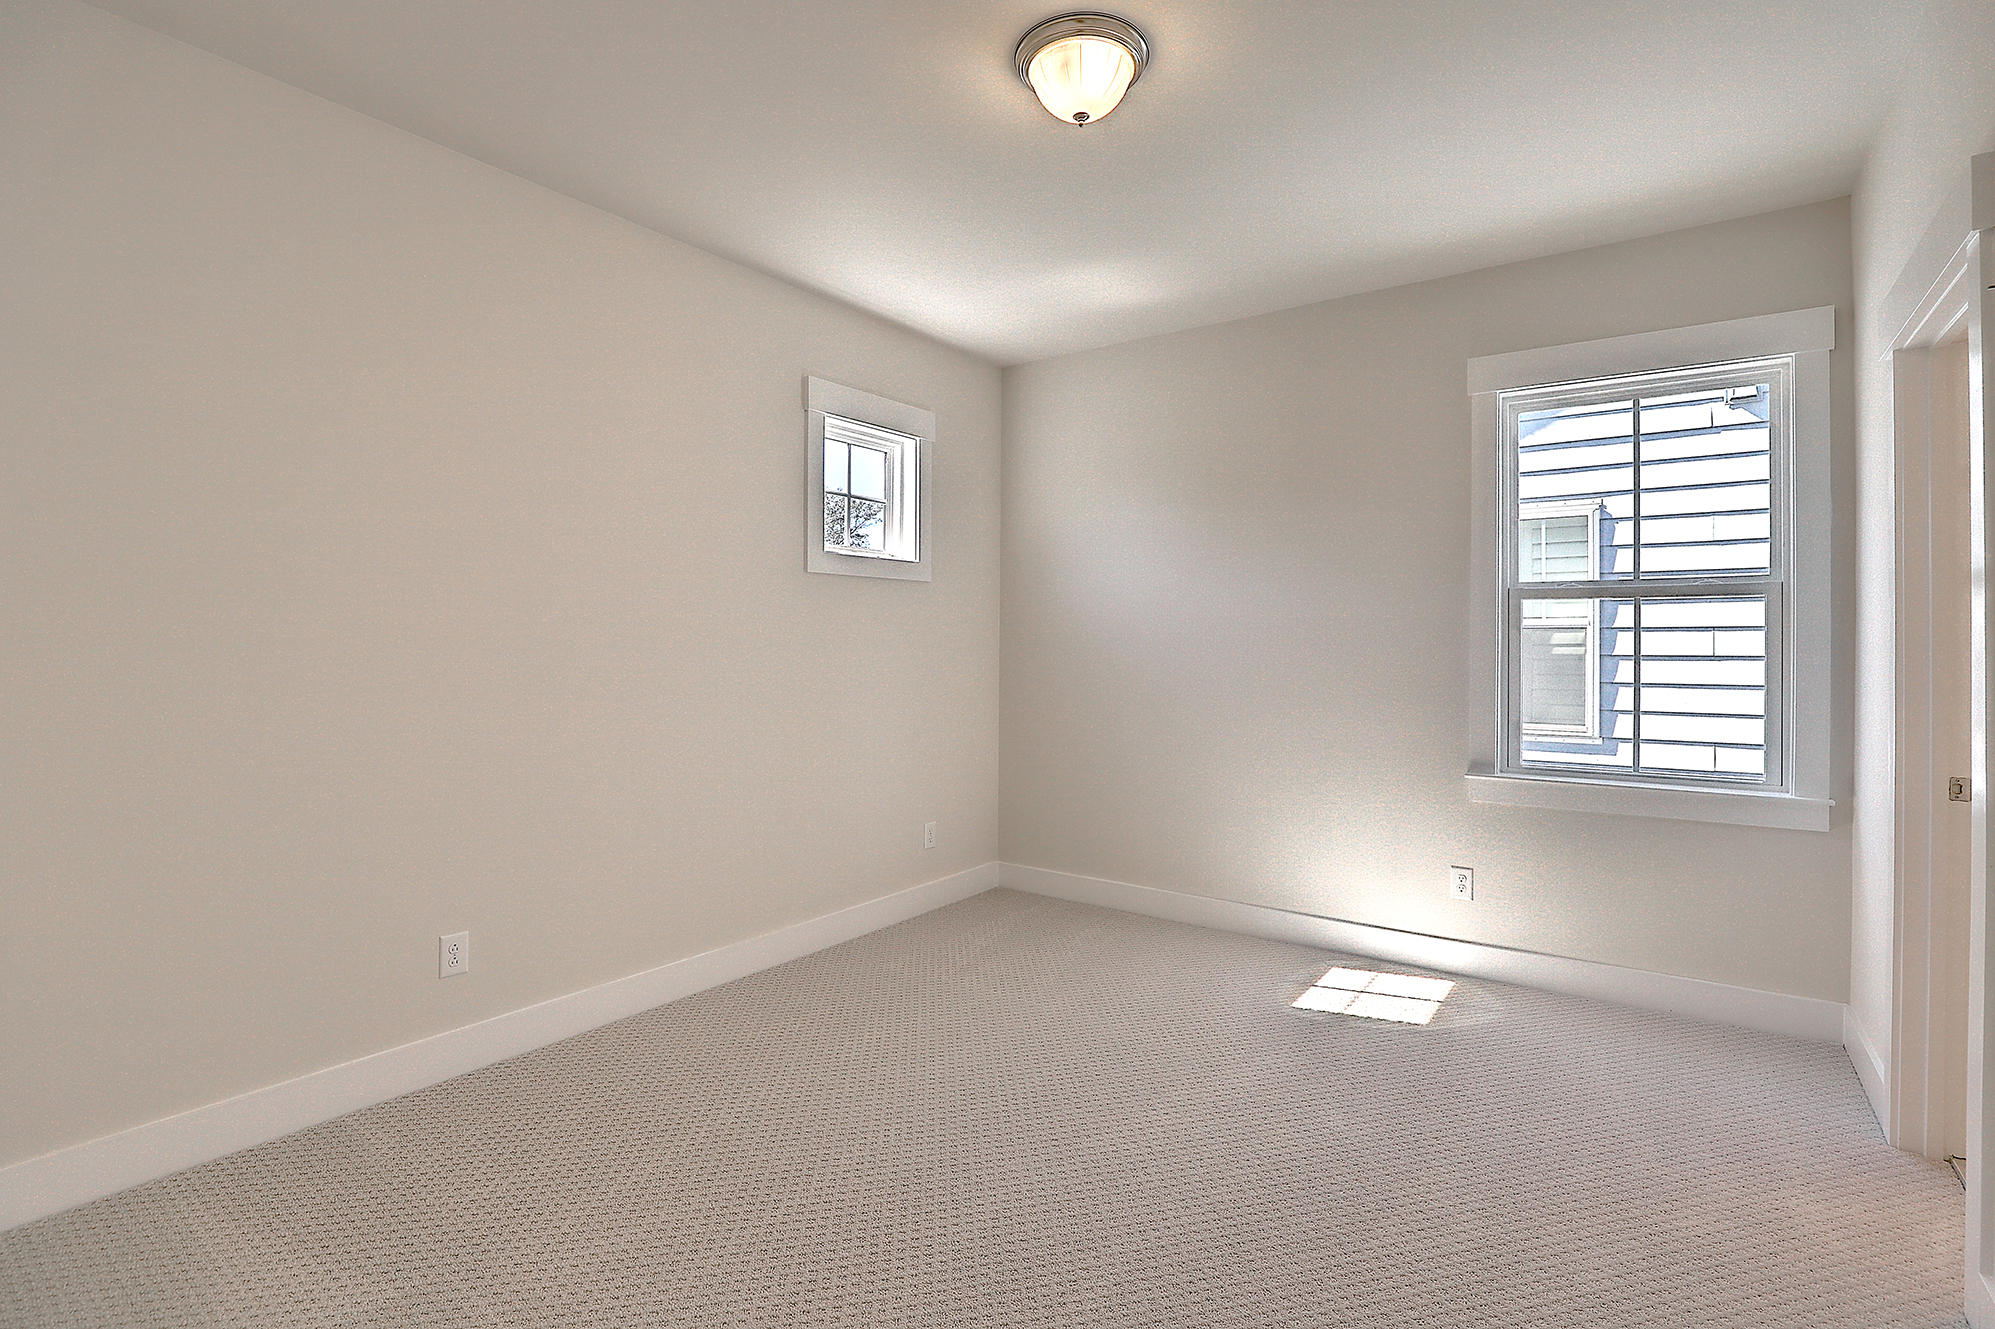 Bentley Park Homes For Sale - 1218 Gannett, Mount Pleasant, SC - 30